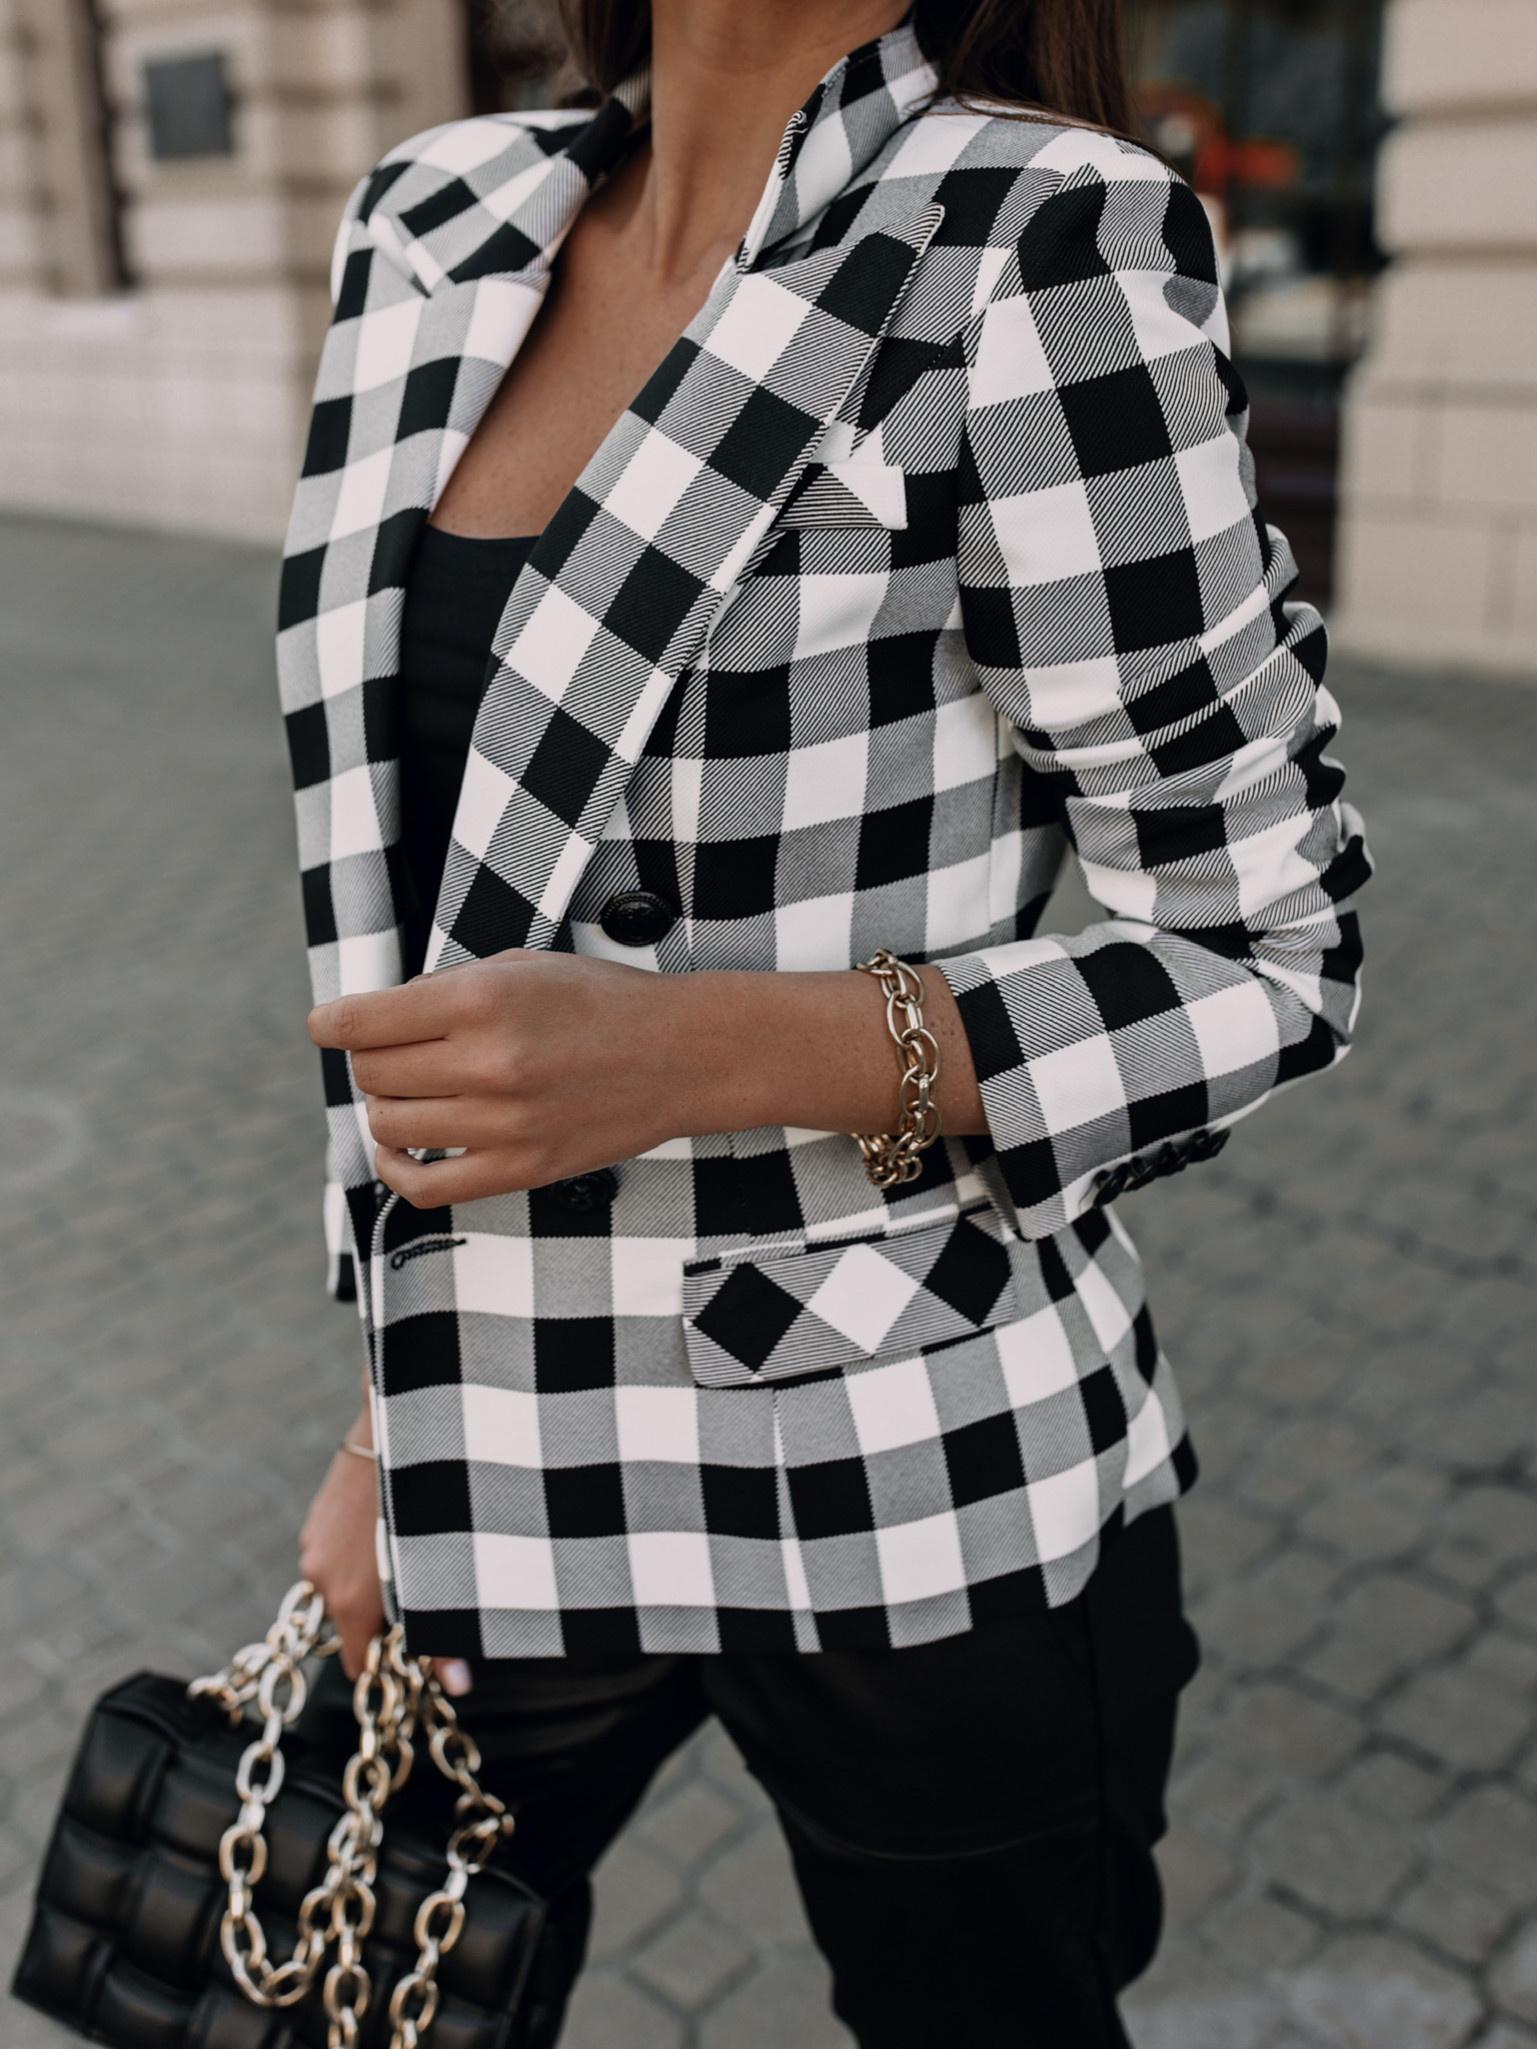 Marynarka Besson square black/white